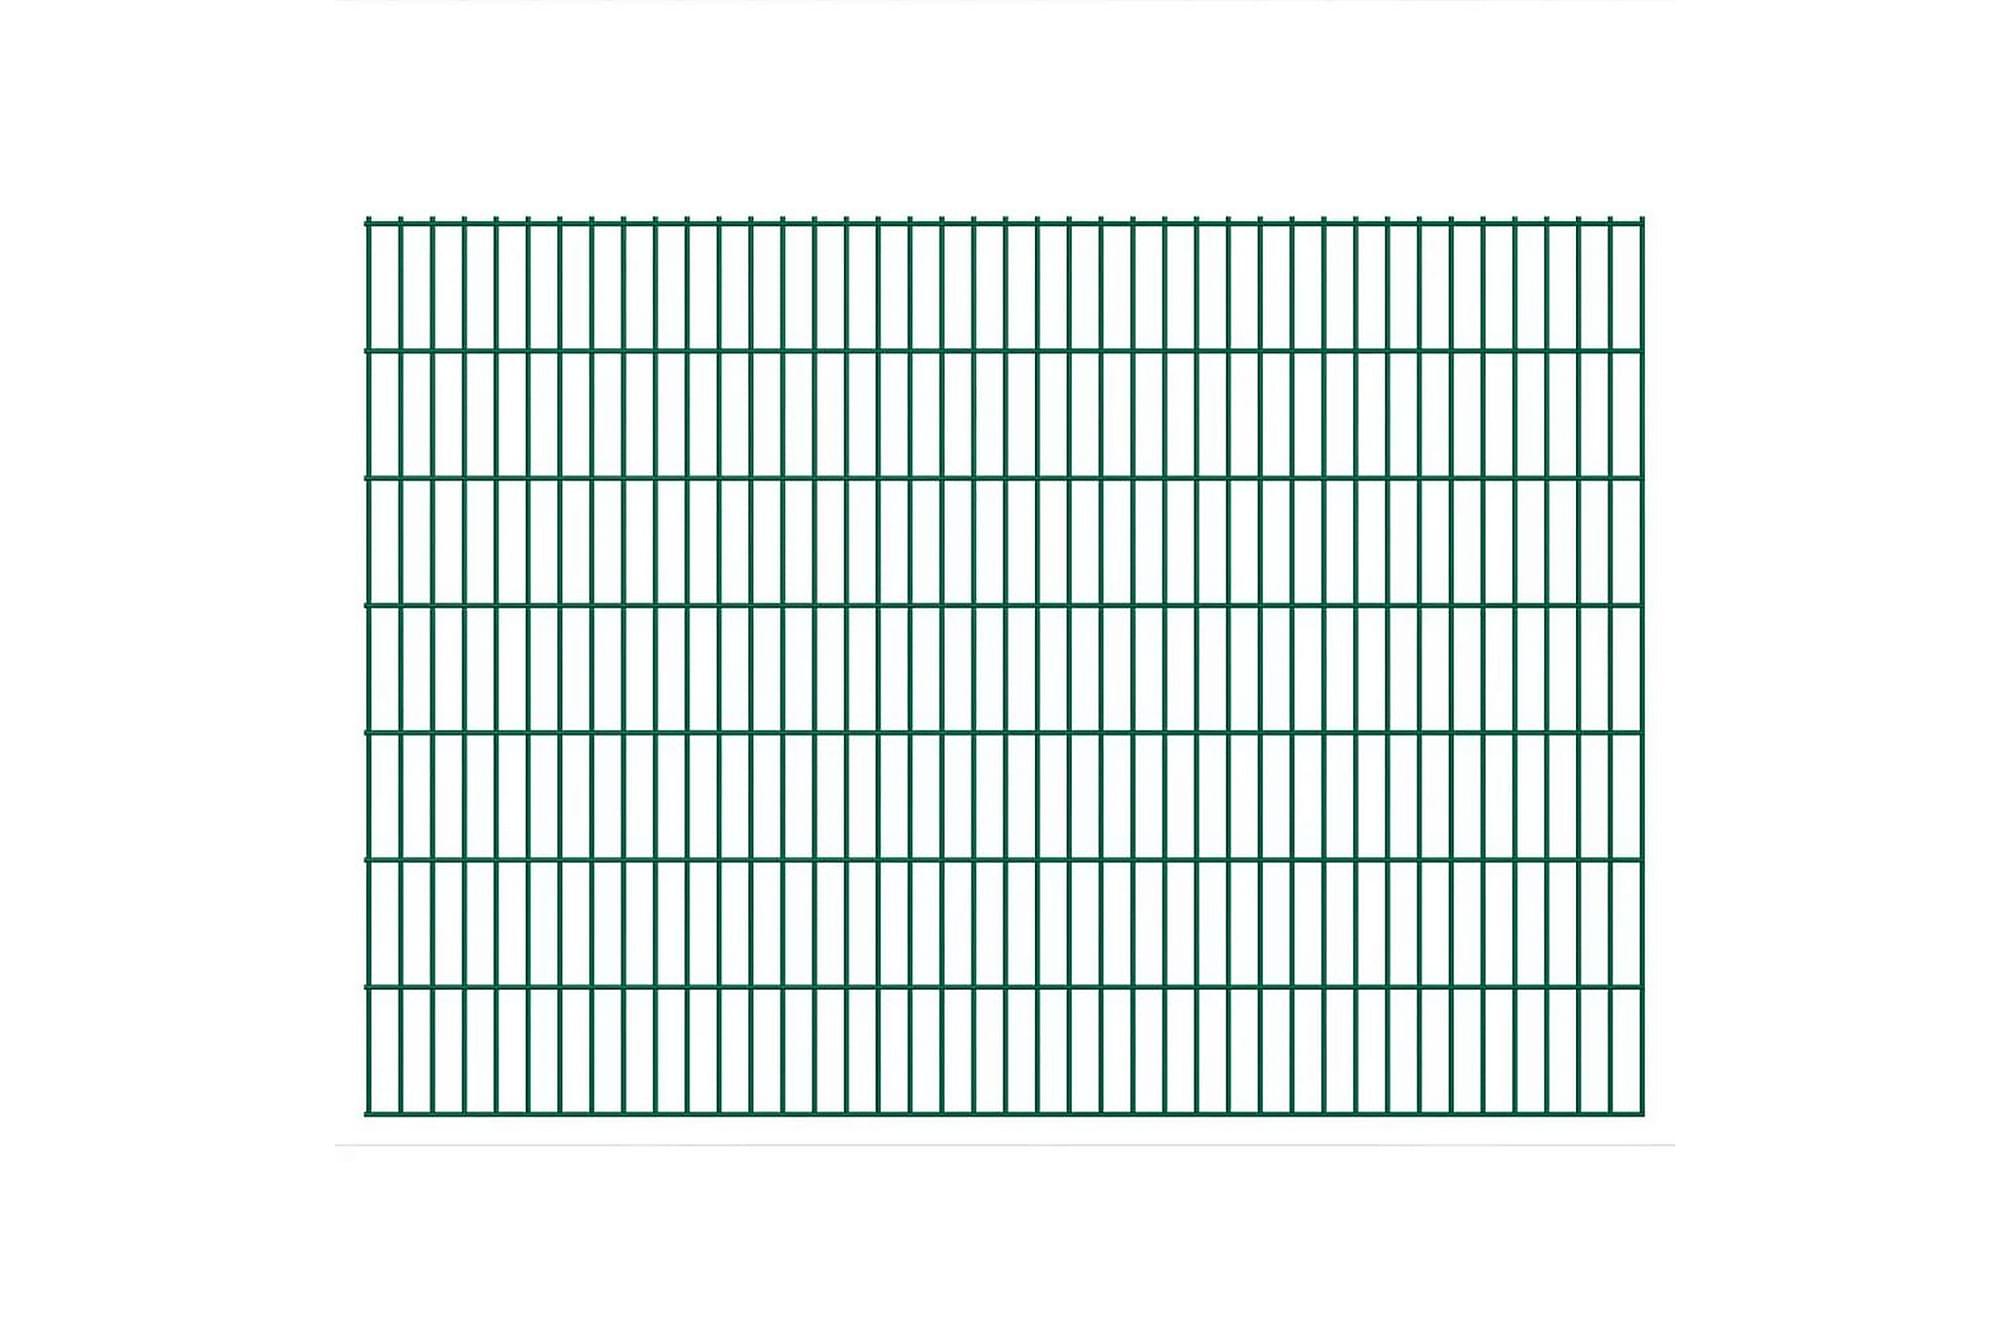 2D Stängselpaneler 2,008x1,43 m grön, Staket & grindar